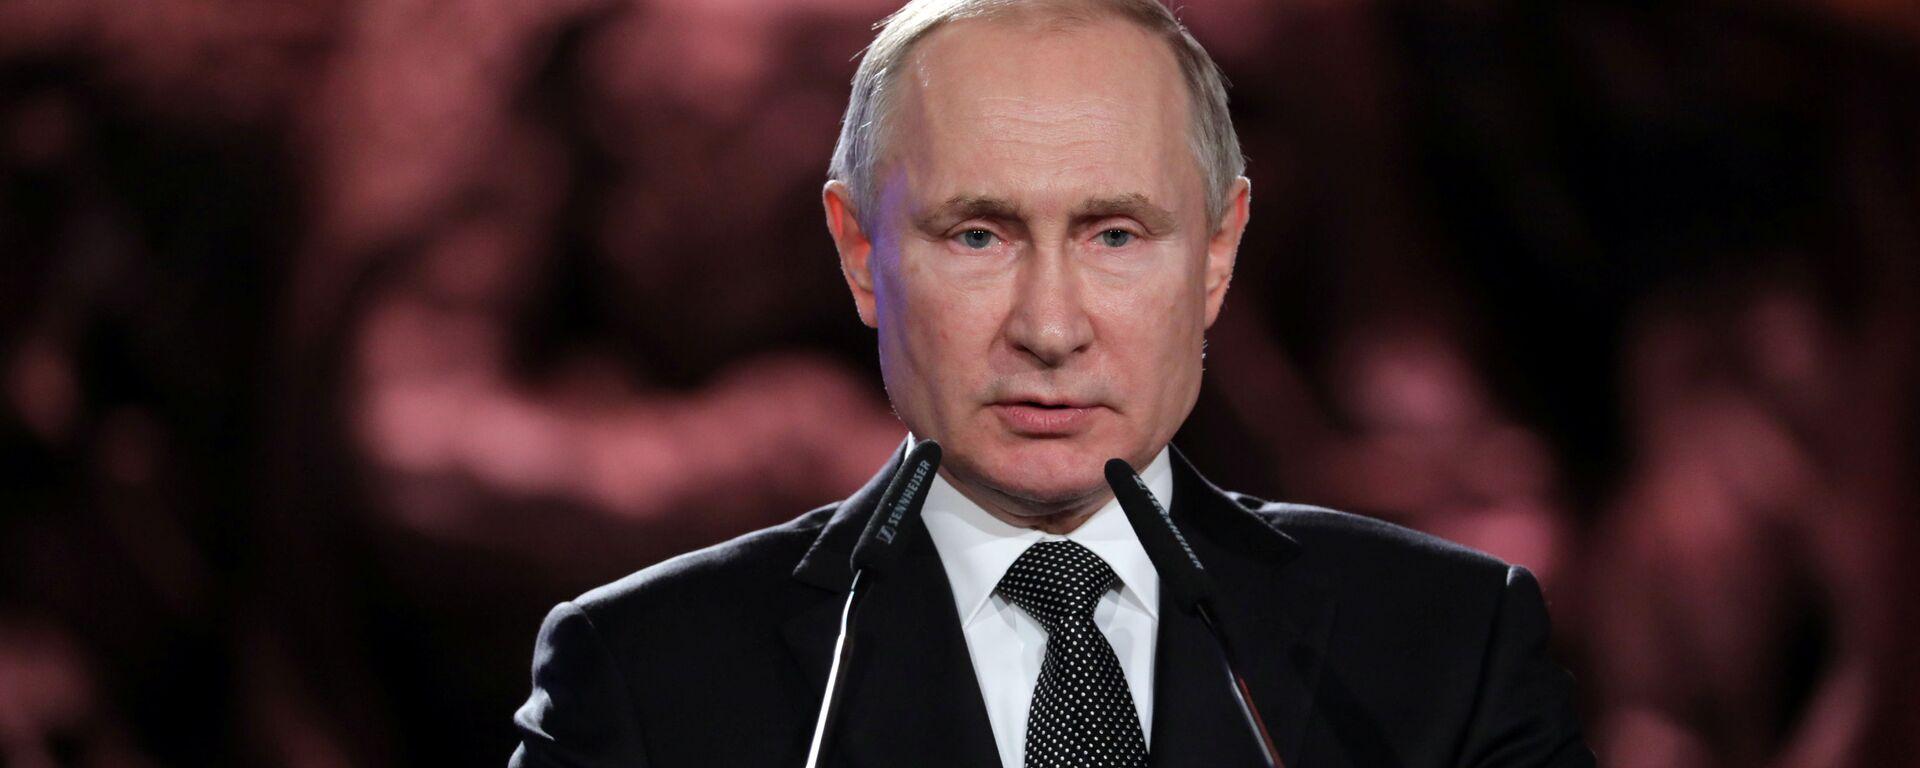 Президент России Владимир Путин - Sputnik Таджикистан, 1920, 23.01.2020